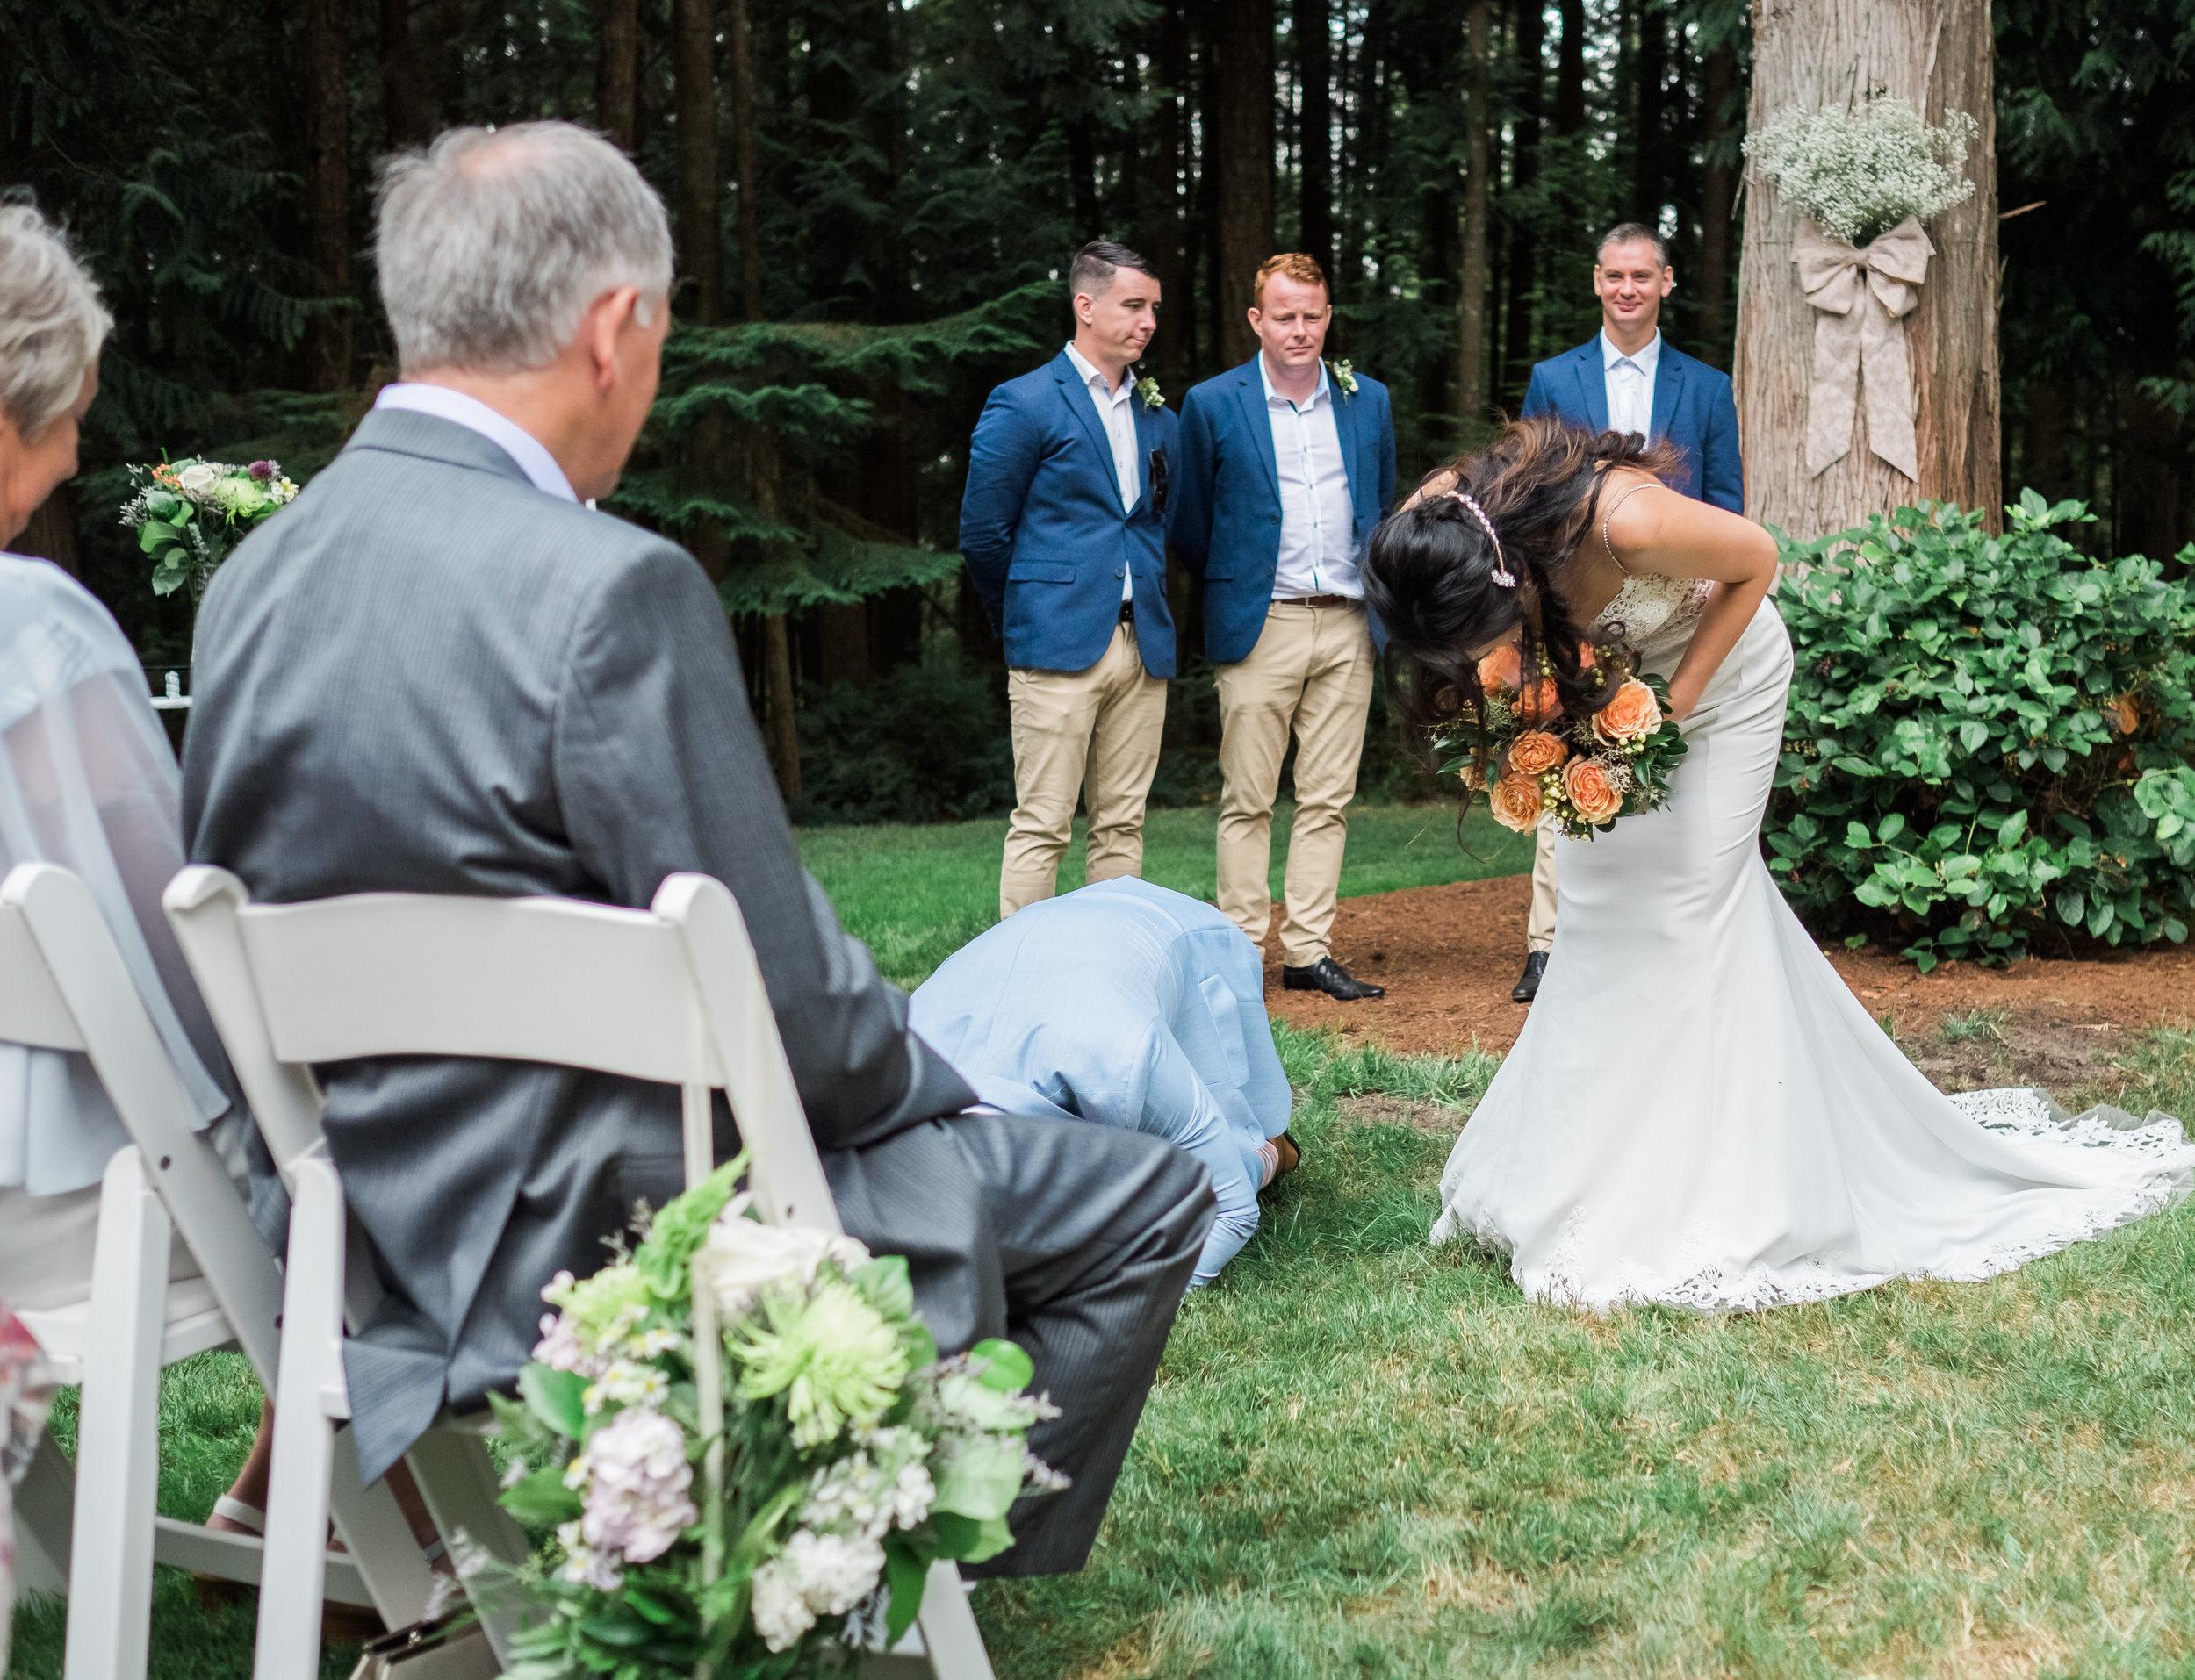 Linwood House Wedding Photos - Roberts Creek Wedding Photos - Vancouver Wedding Photographer & Videographer - Sunshine Coast Wedding Photos - Sunshine Coast Wedding Photographer - Jennifer Picard Photography - DSCF9093.jpg